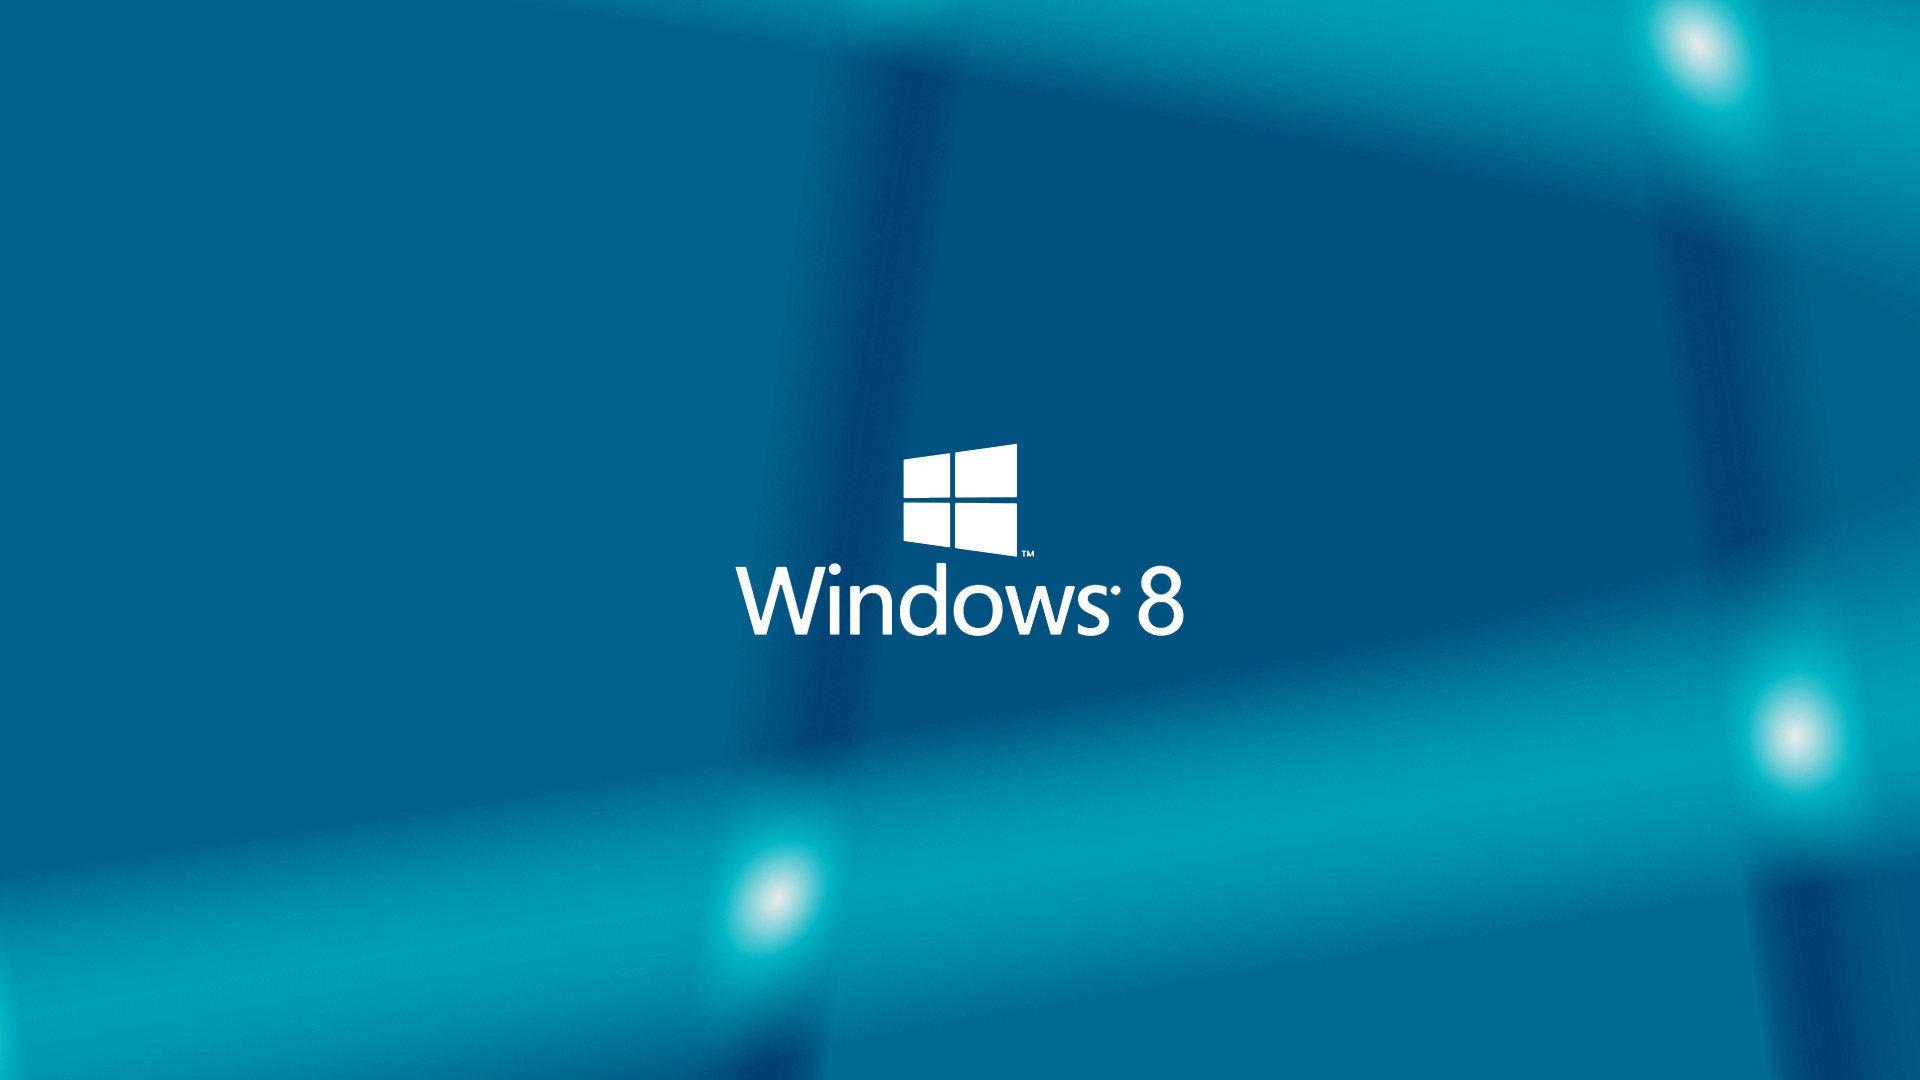 Windows 8 Wallpapers 4USkYcom 1920x1080